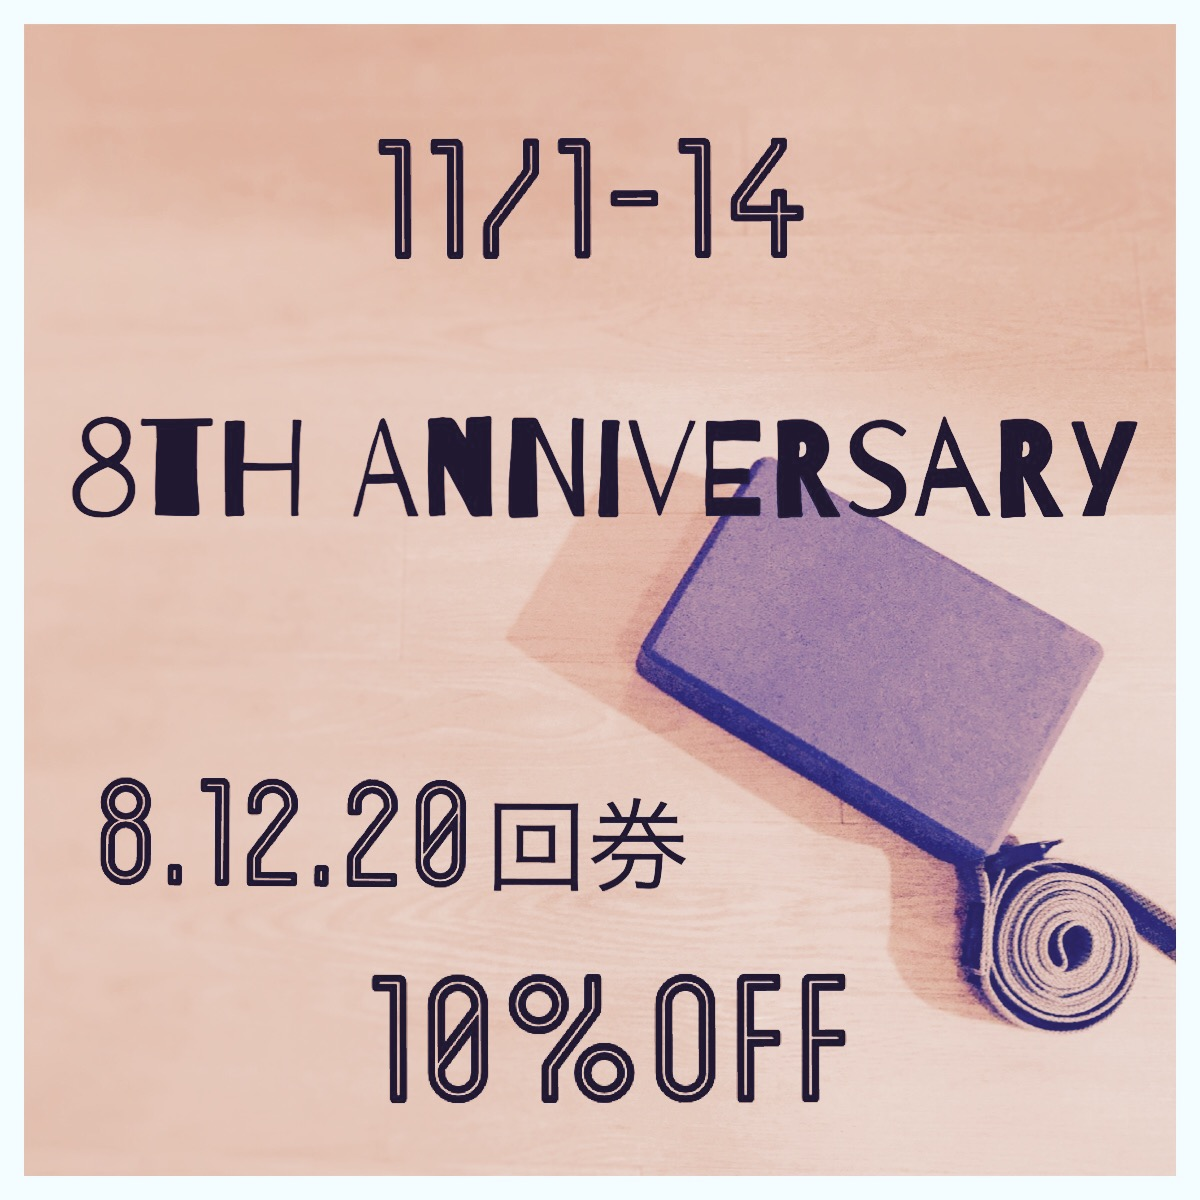 8th Anniversary!!!_f0168650_17585174.jpg